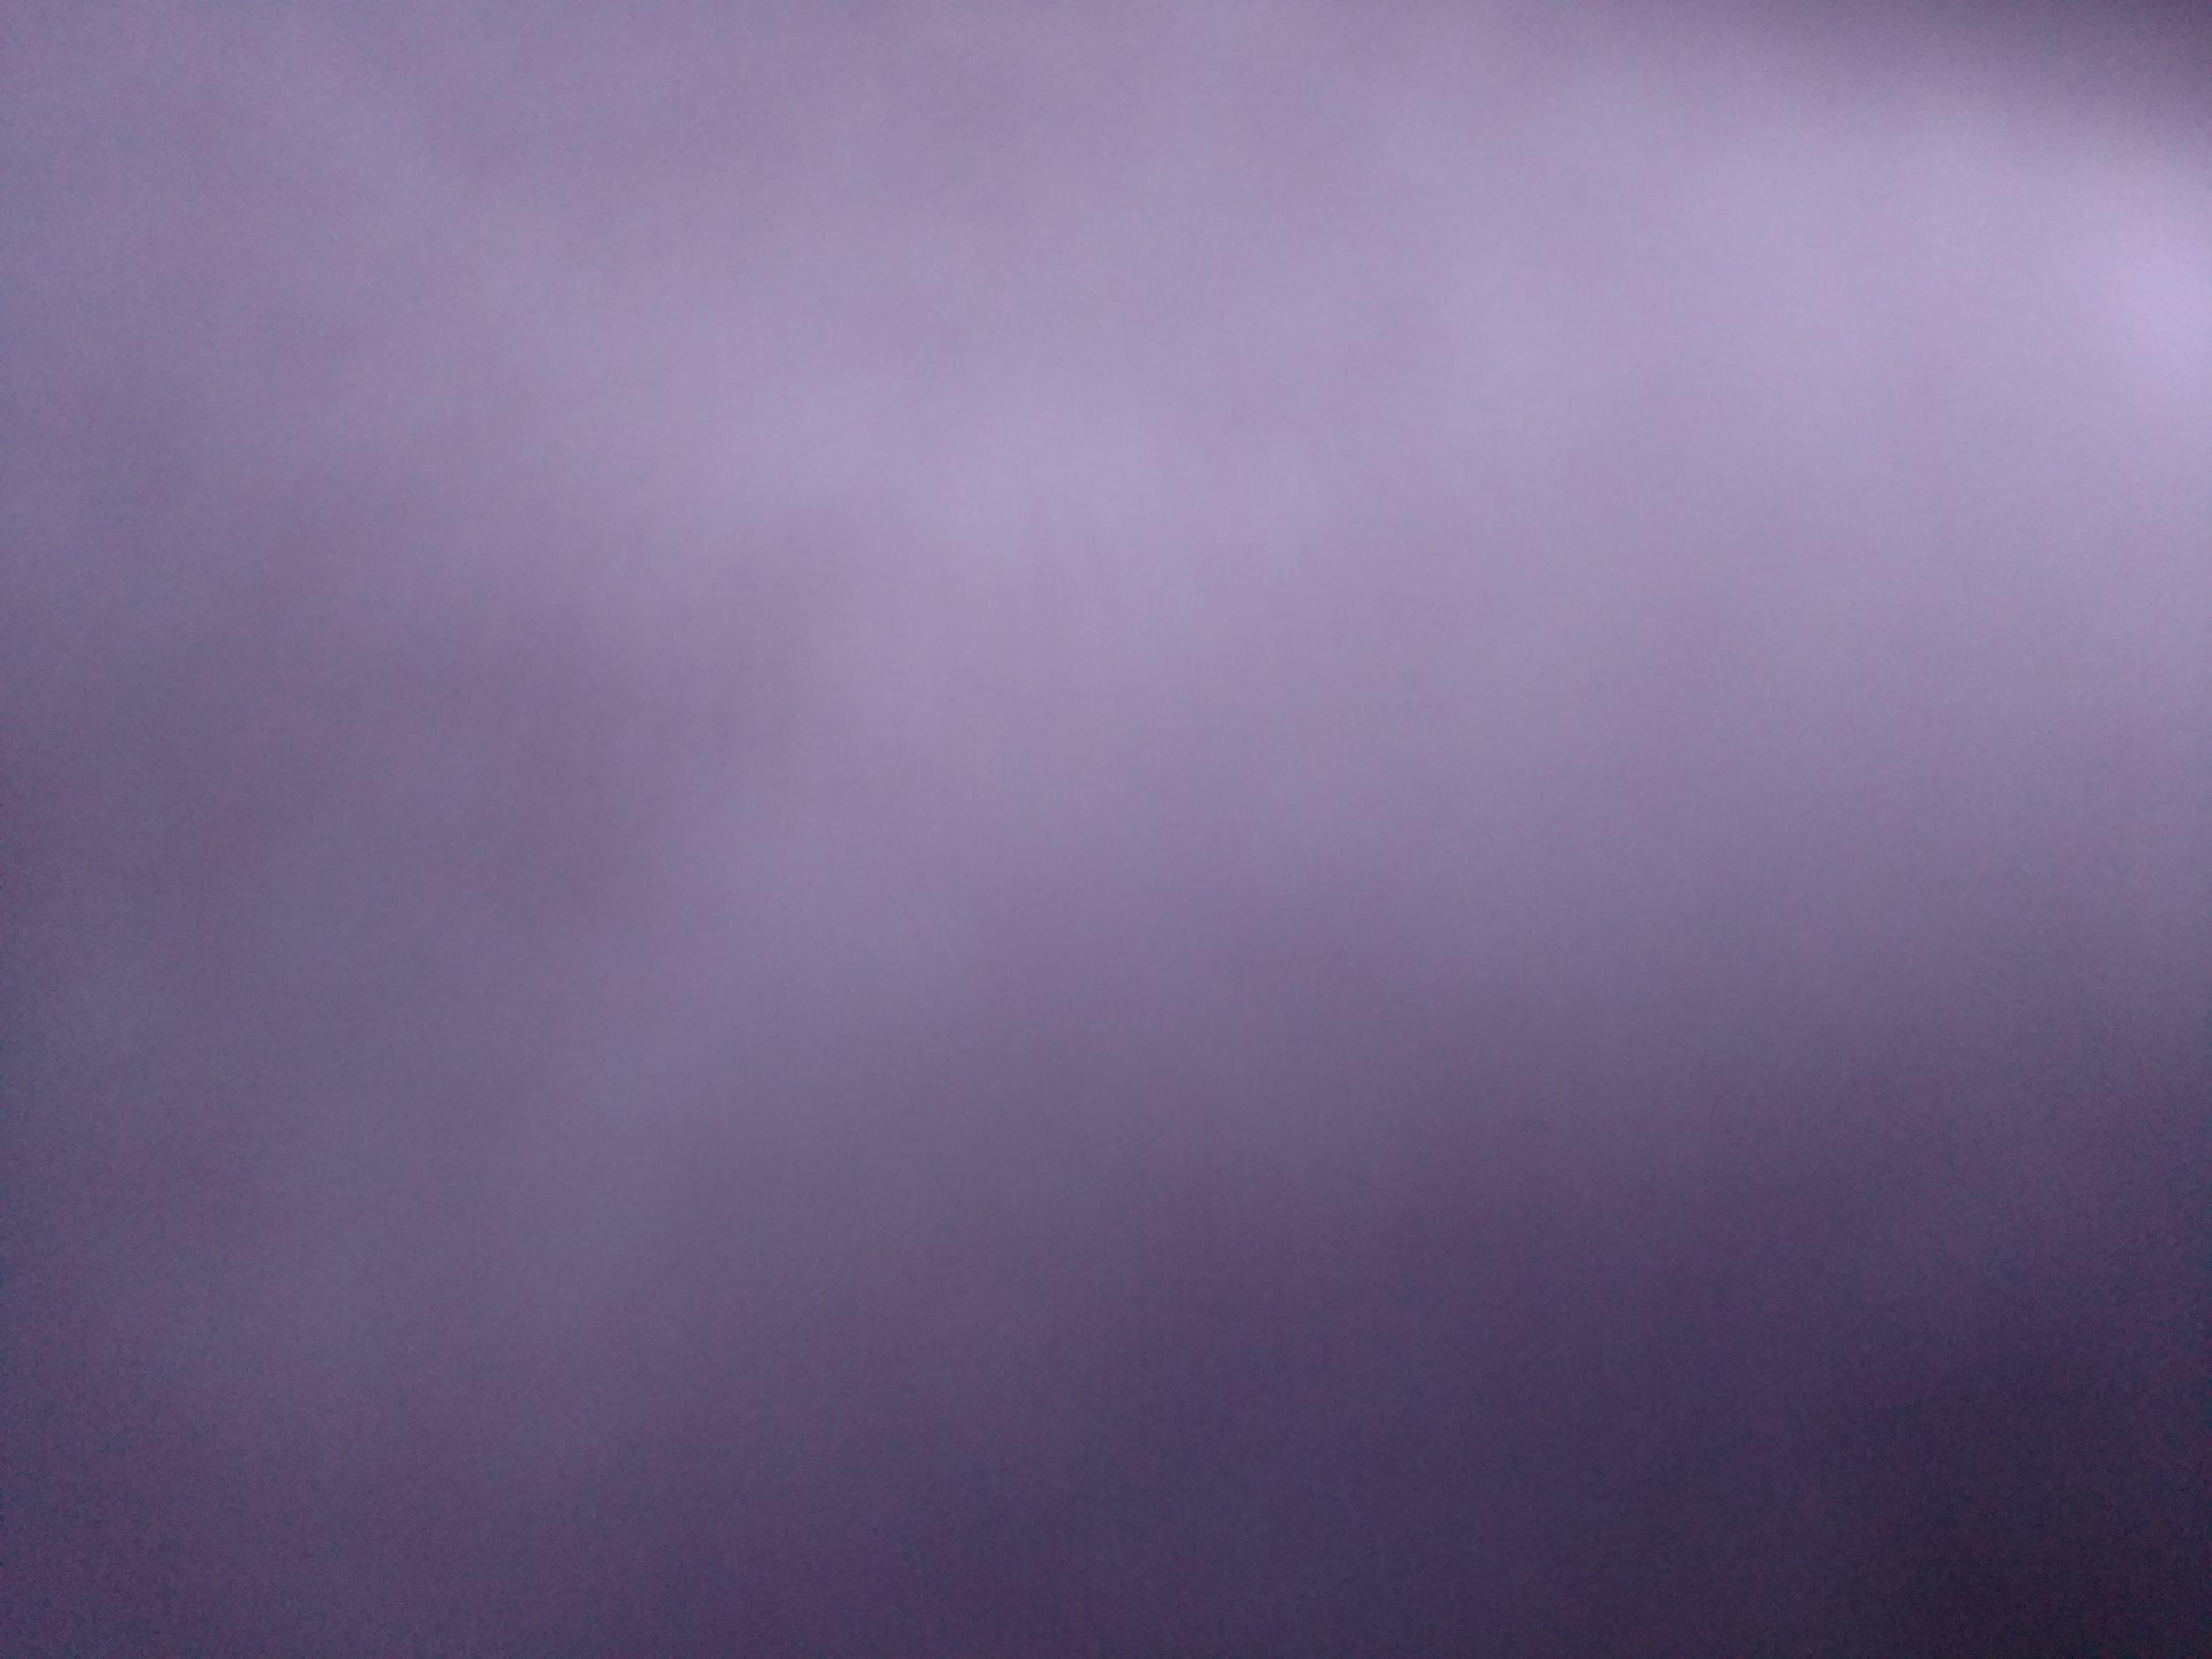 willroth-co-free-texture-gradient-088.jpg